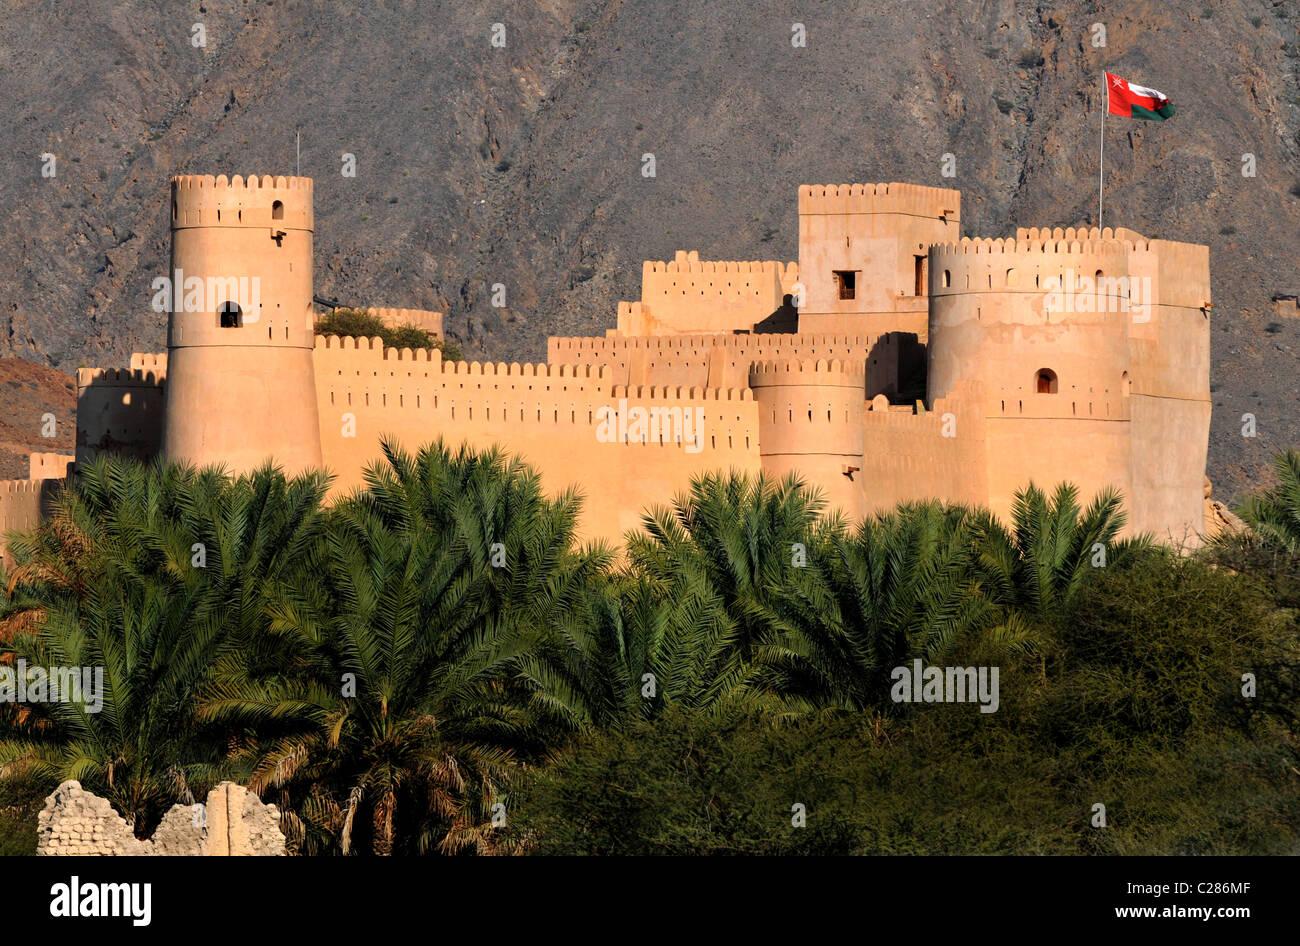 Fort Nakhal, Oman Photo Stock